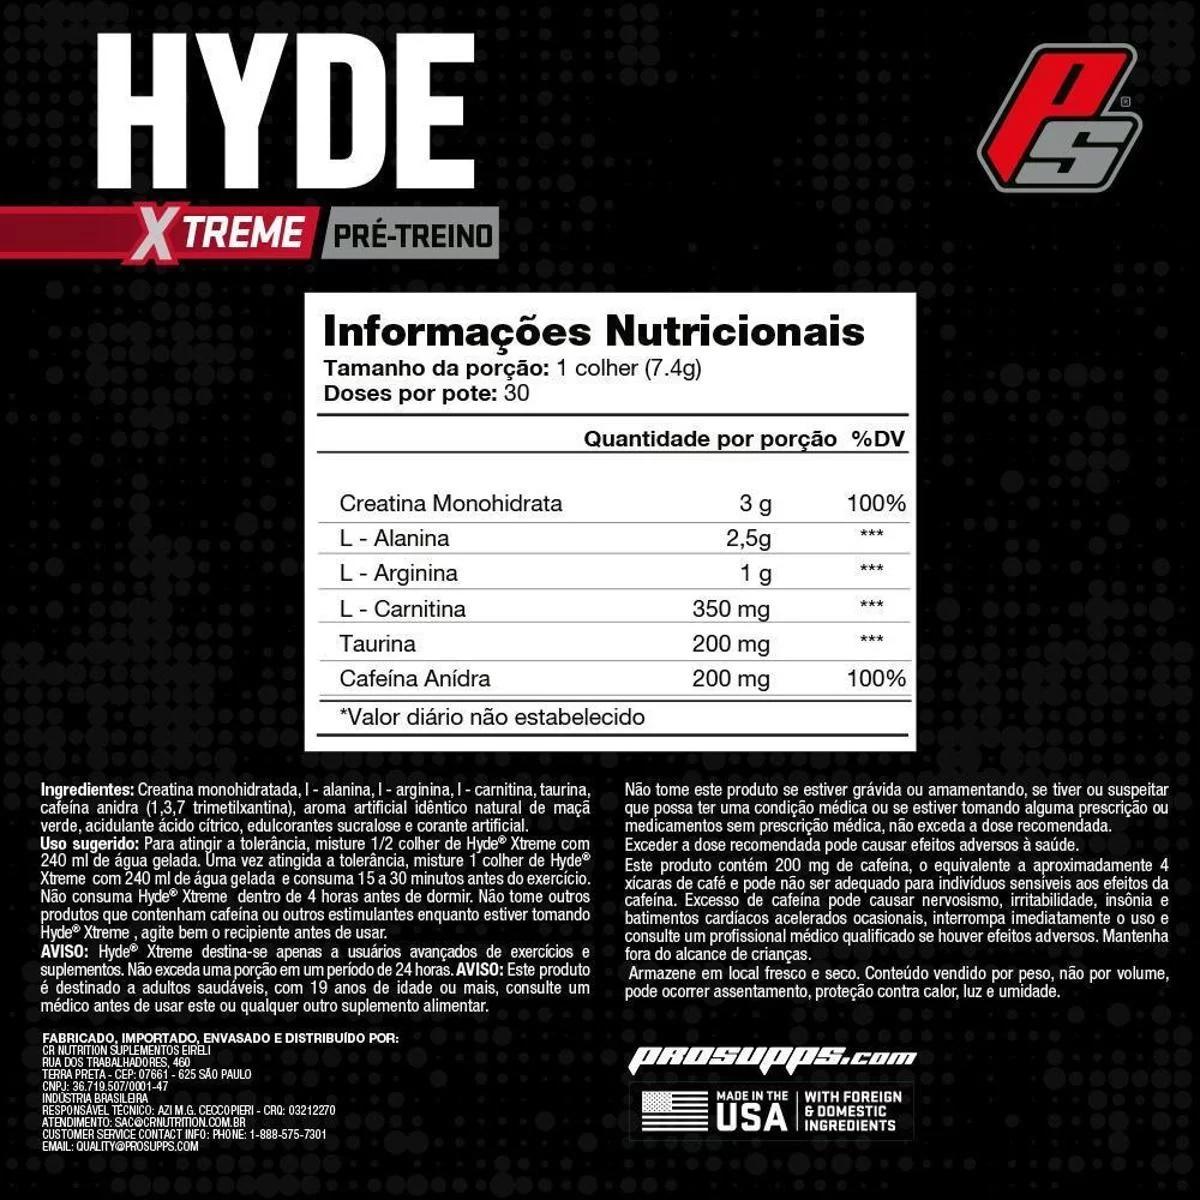 PRÉ-TREINO HYDE EXTREME (222G 30 DOSES) - PROSUPPS